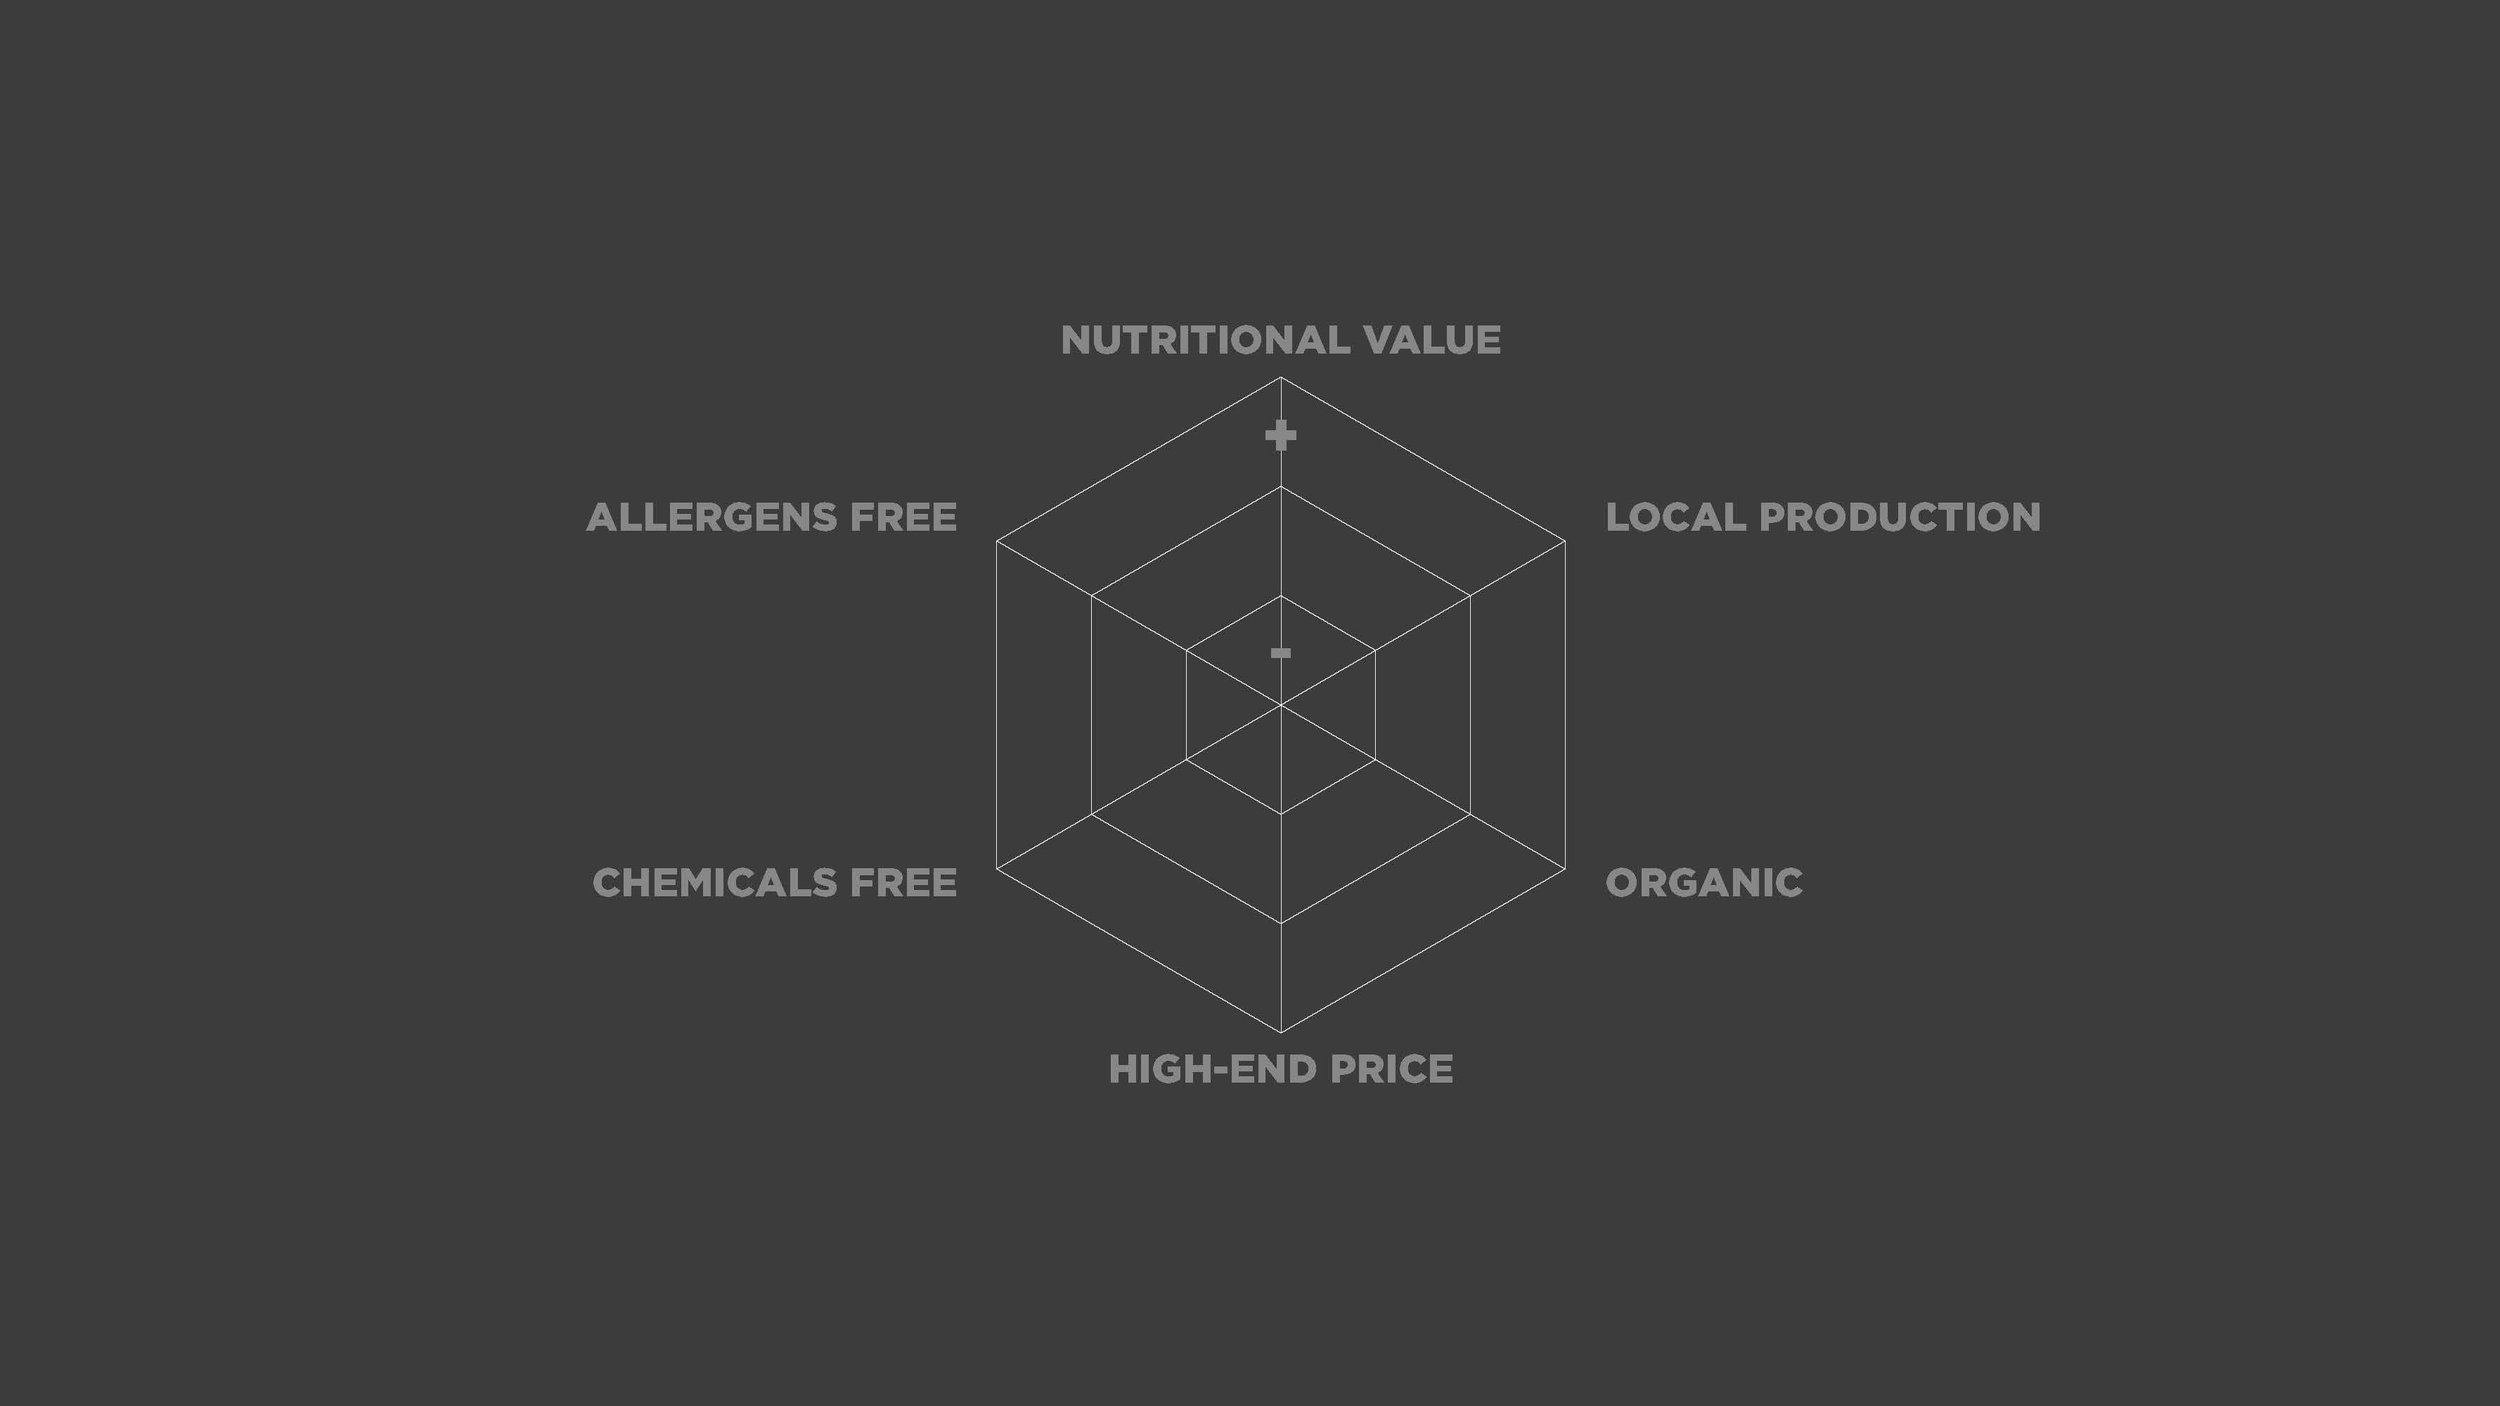 Food Transprancy Final Presentation_Page_109.jpg